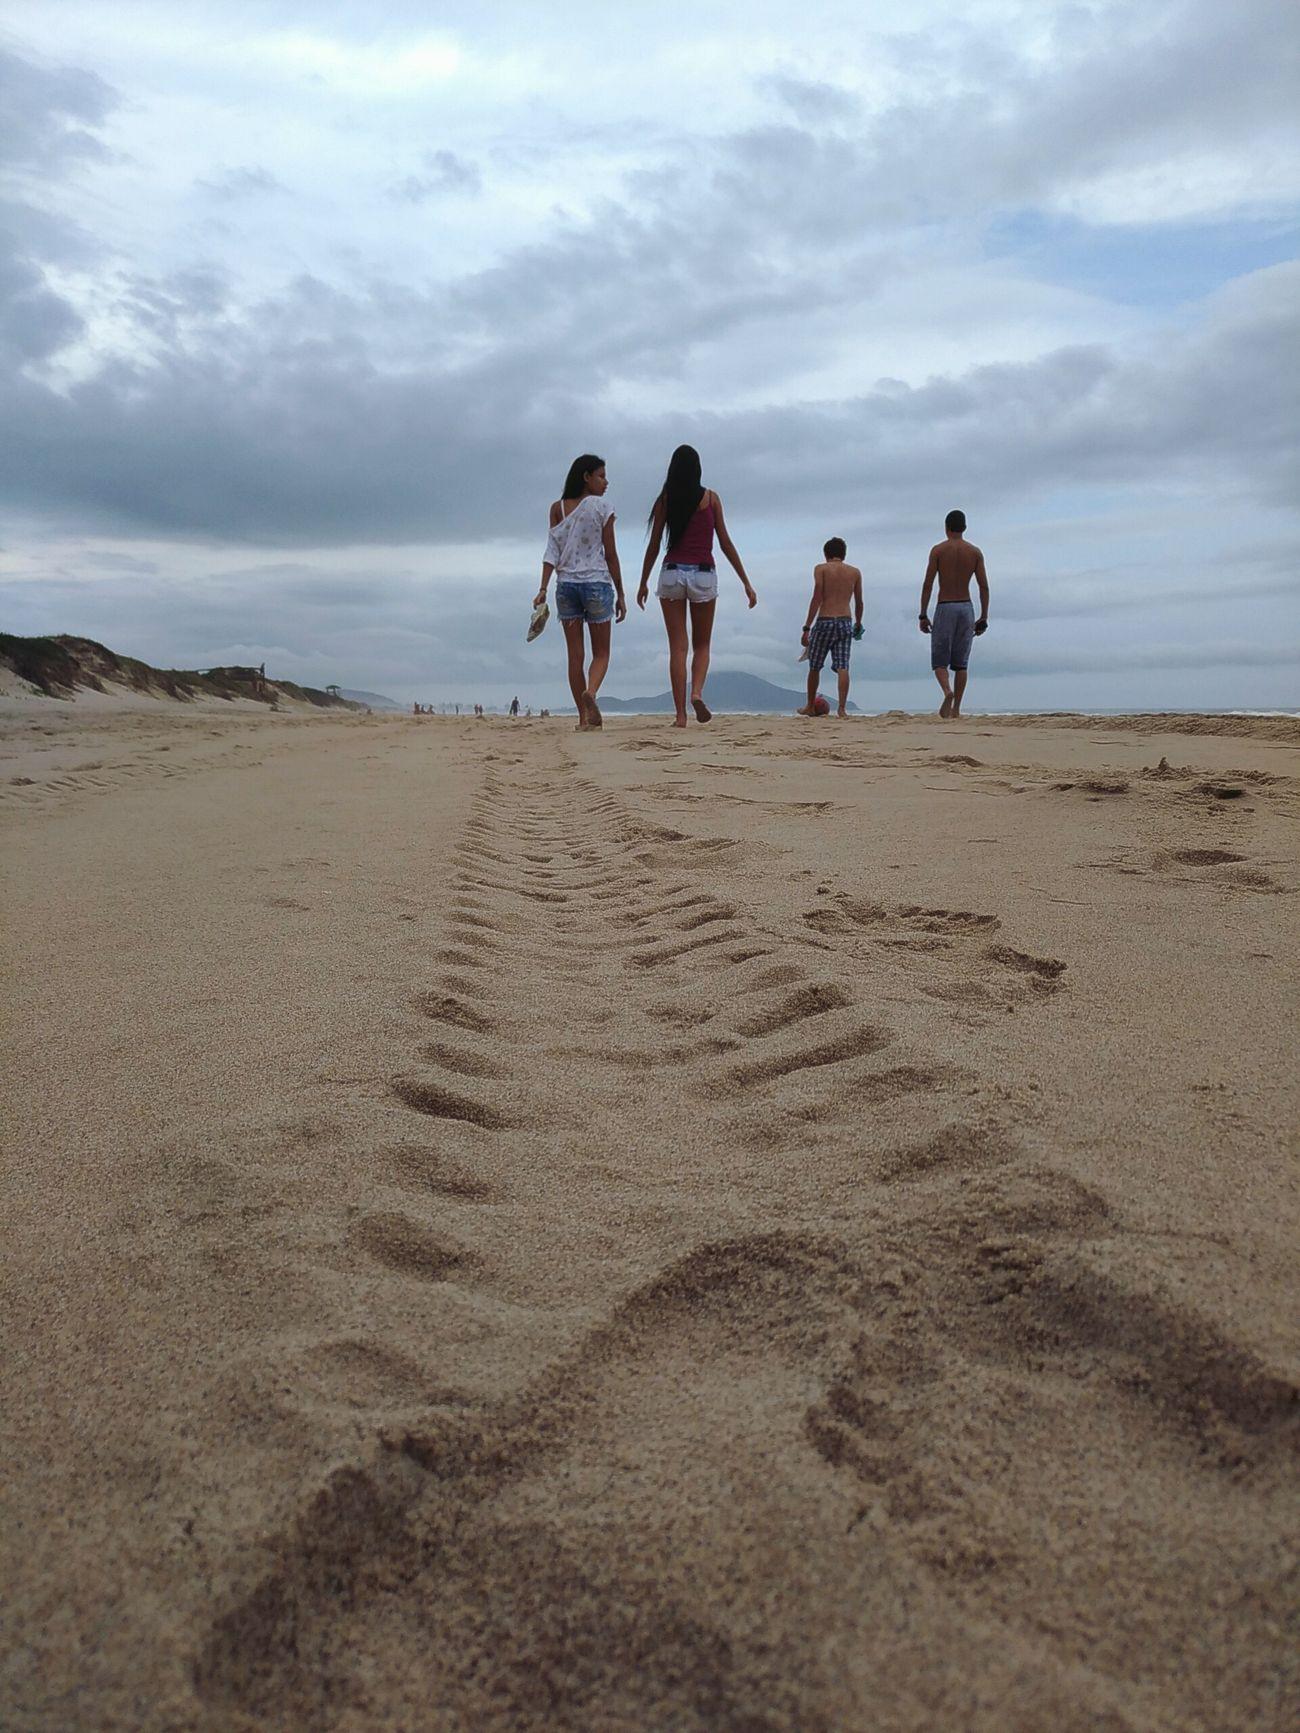 Rolezin rendeu em fotos Beach Photography nature